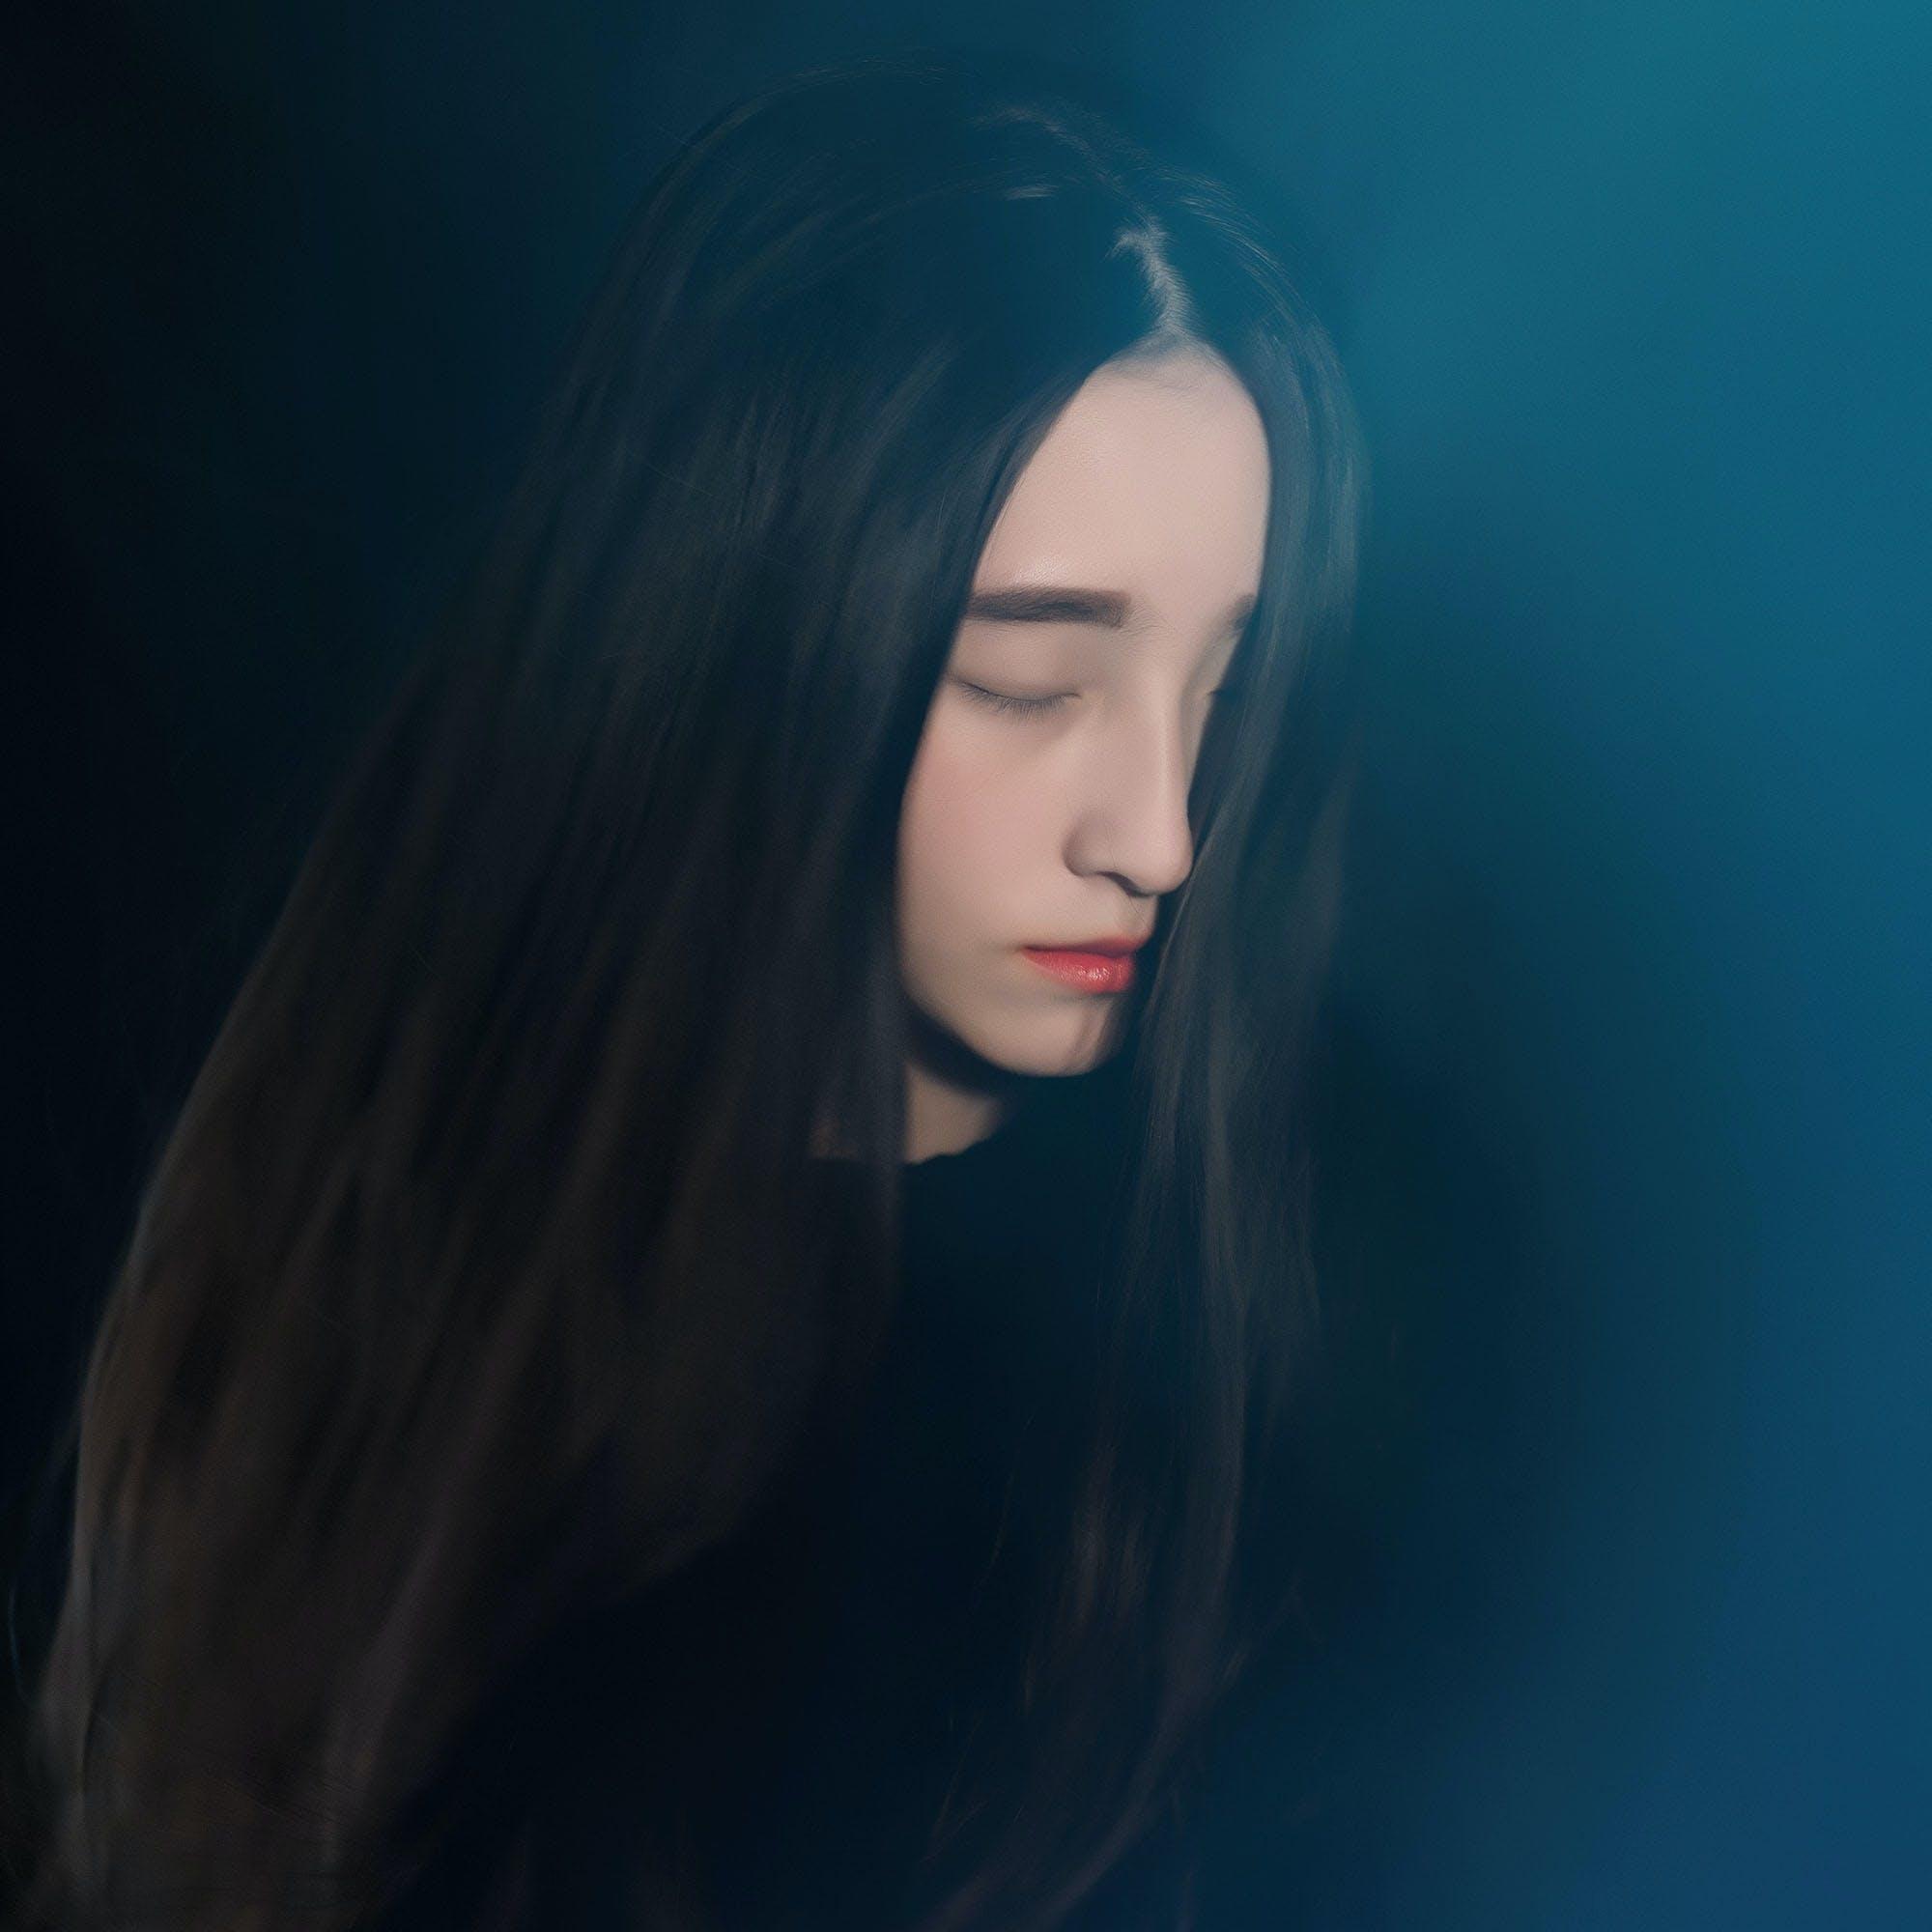 Free stock photo of face, portrait, long hair, black hair